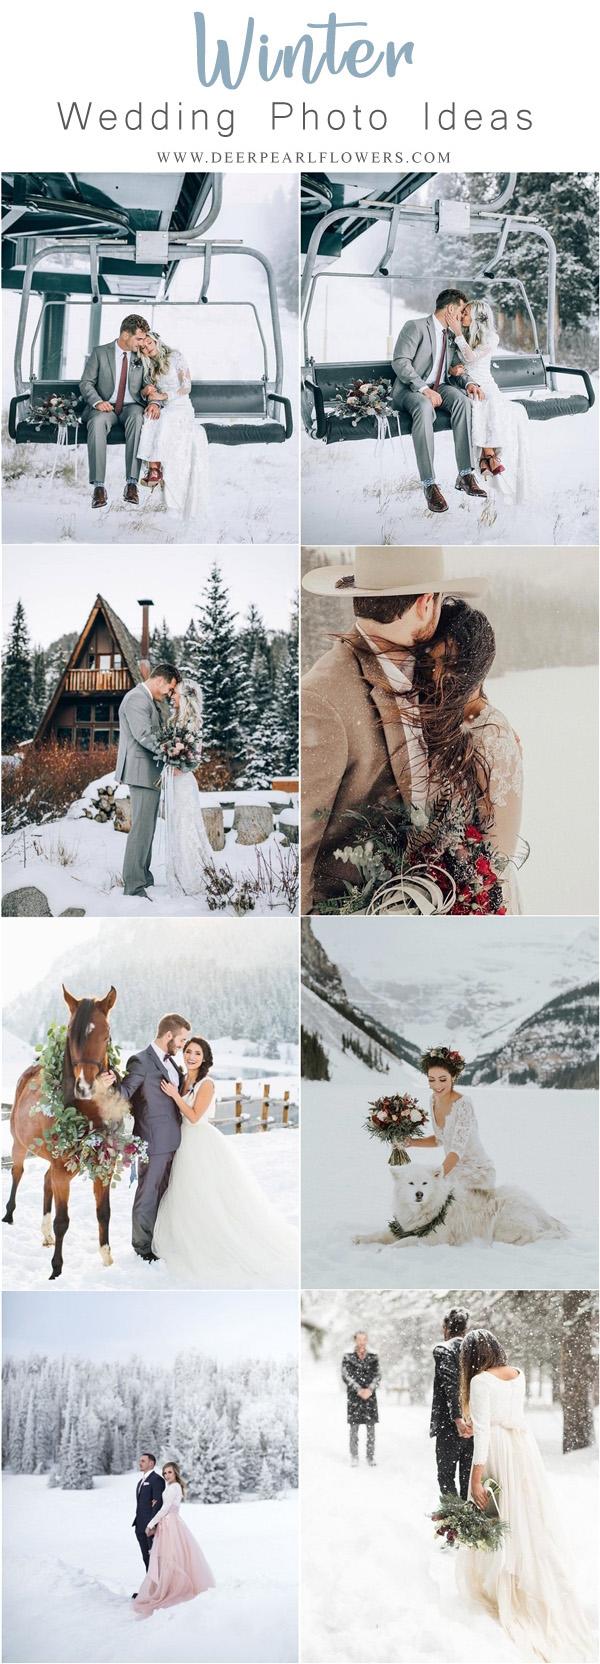 Winter Wedding Ideas 20 Stunning Winter Wedding Photography Ideas Deer Pearl Flowers